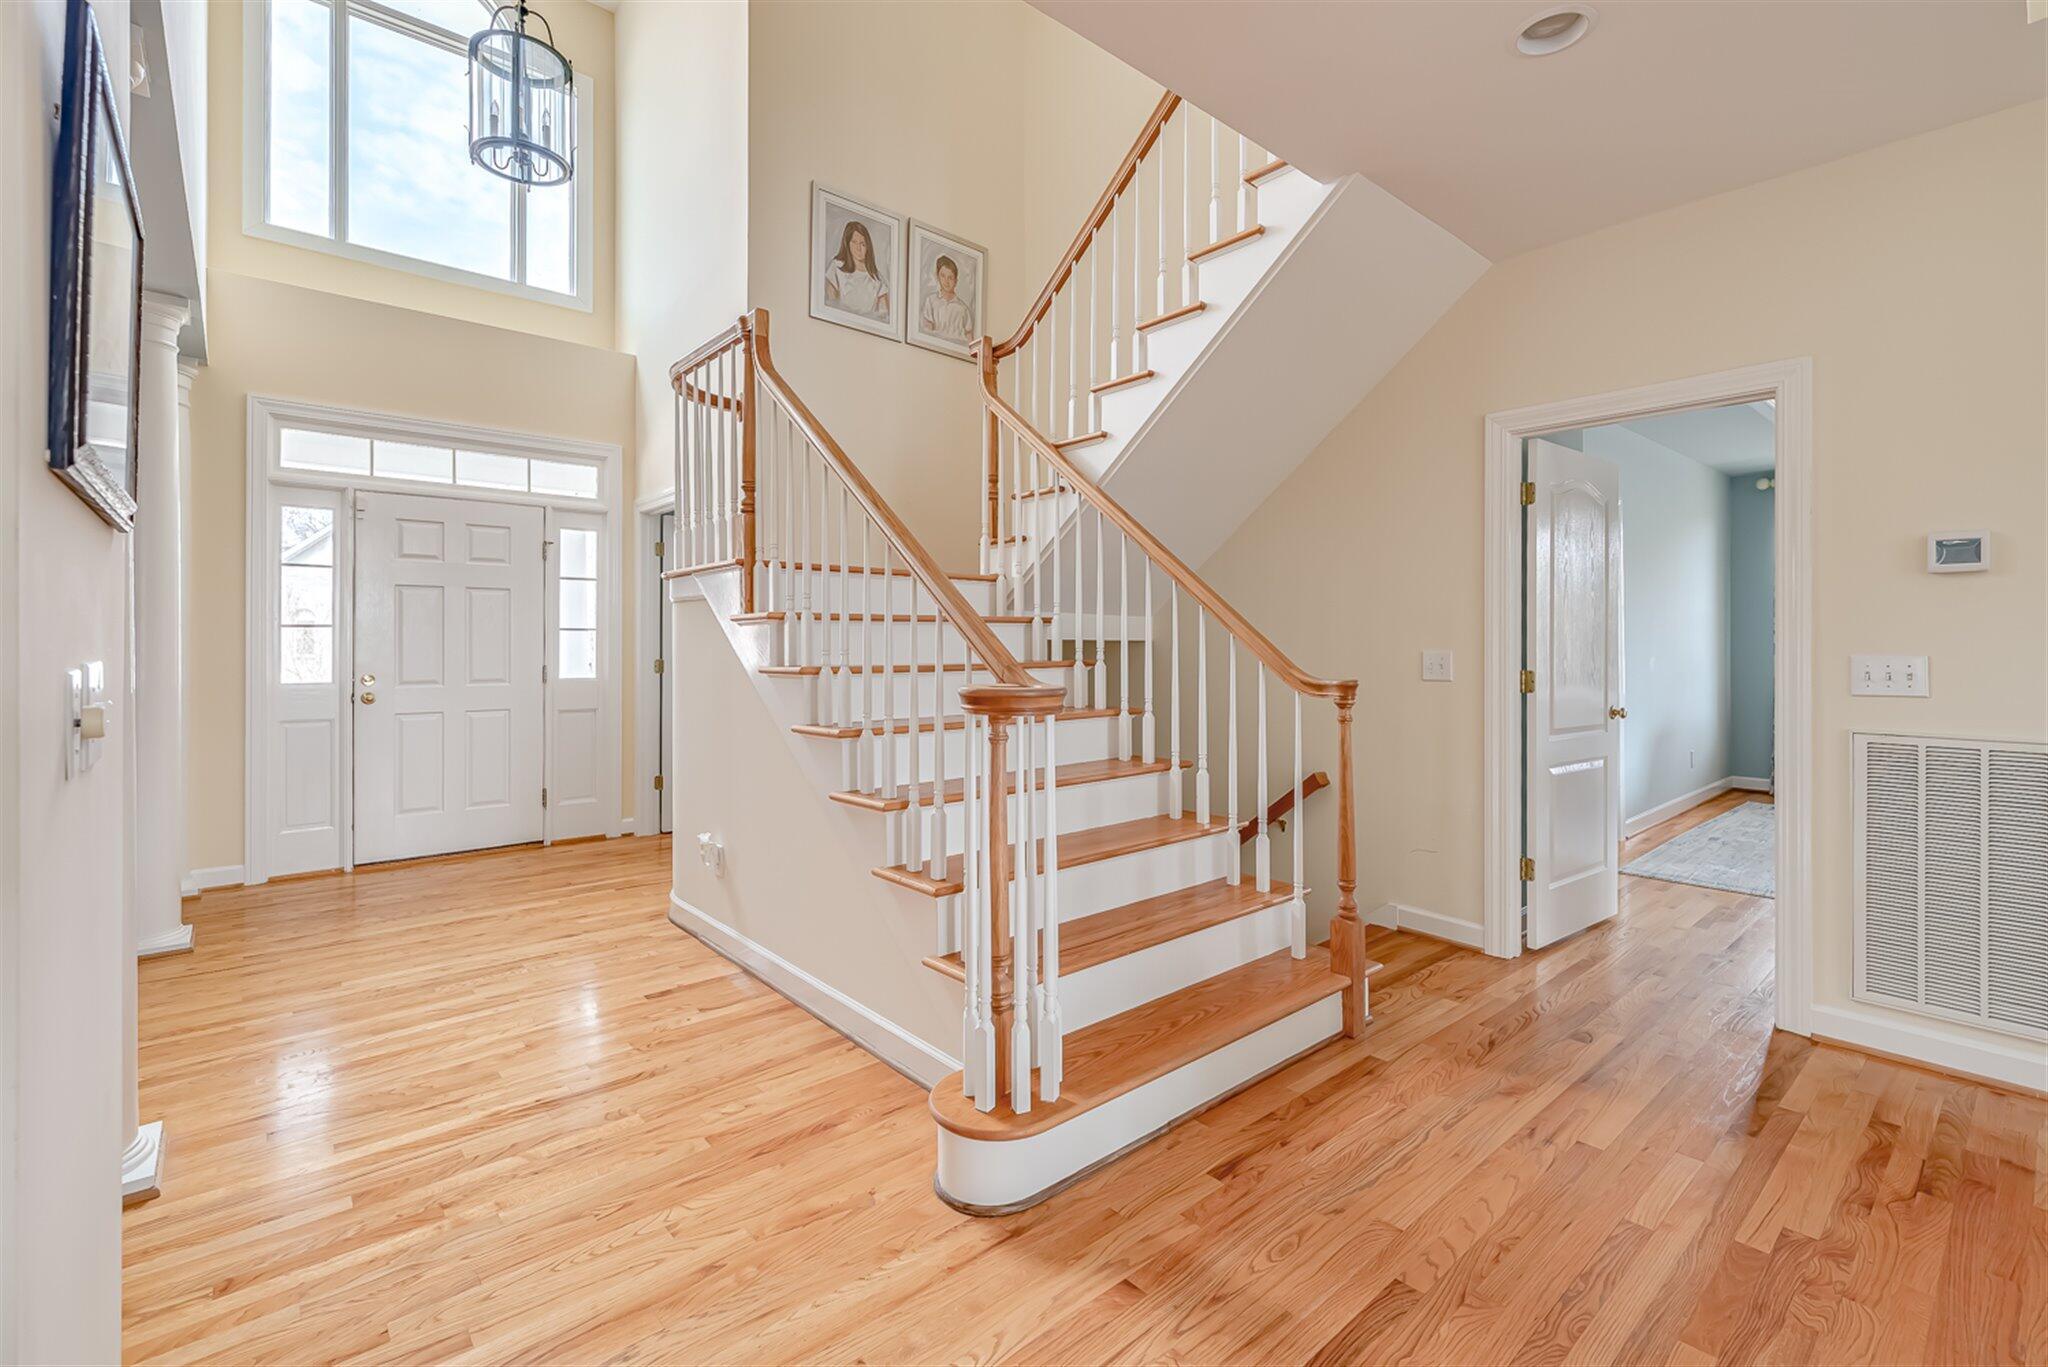 Indigo Point Homes For Sale - 50 Indigo Point, Charleston, SC - 18